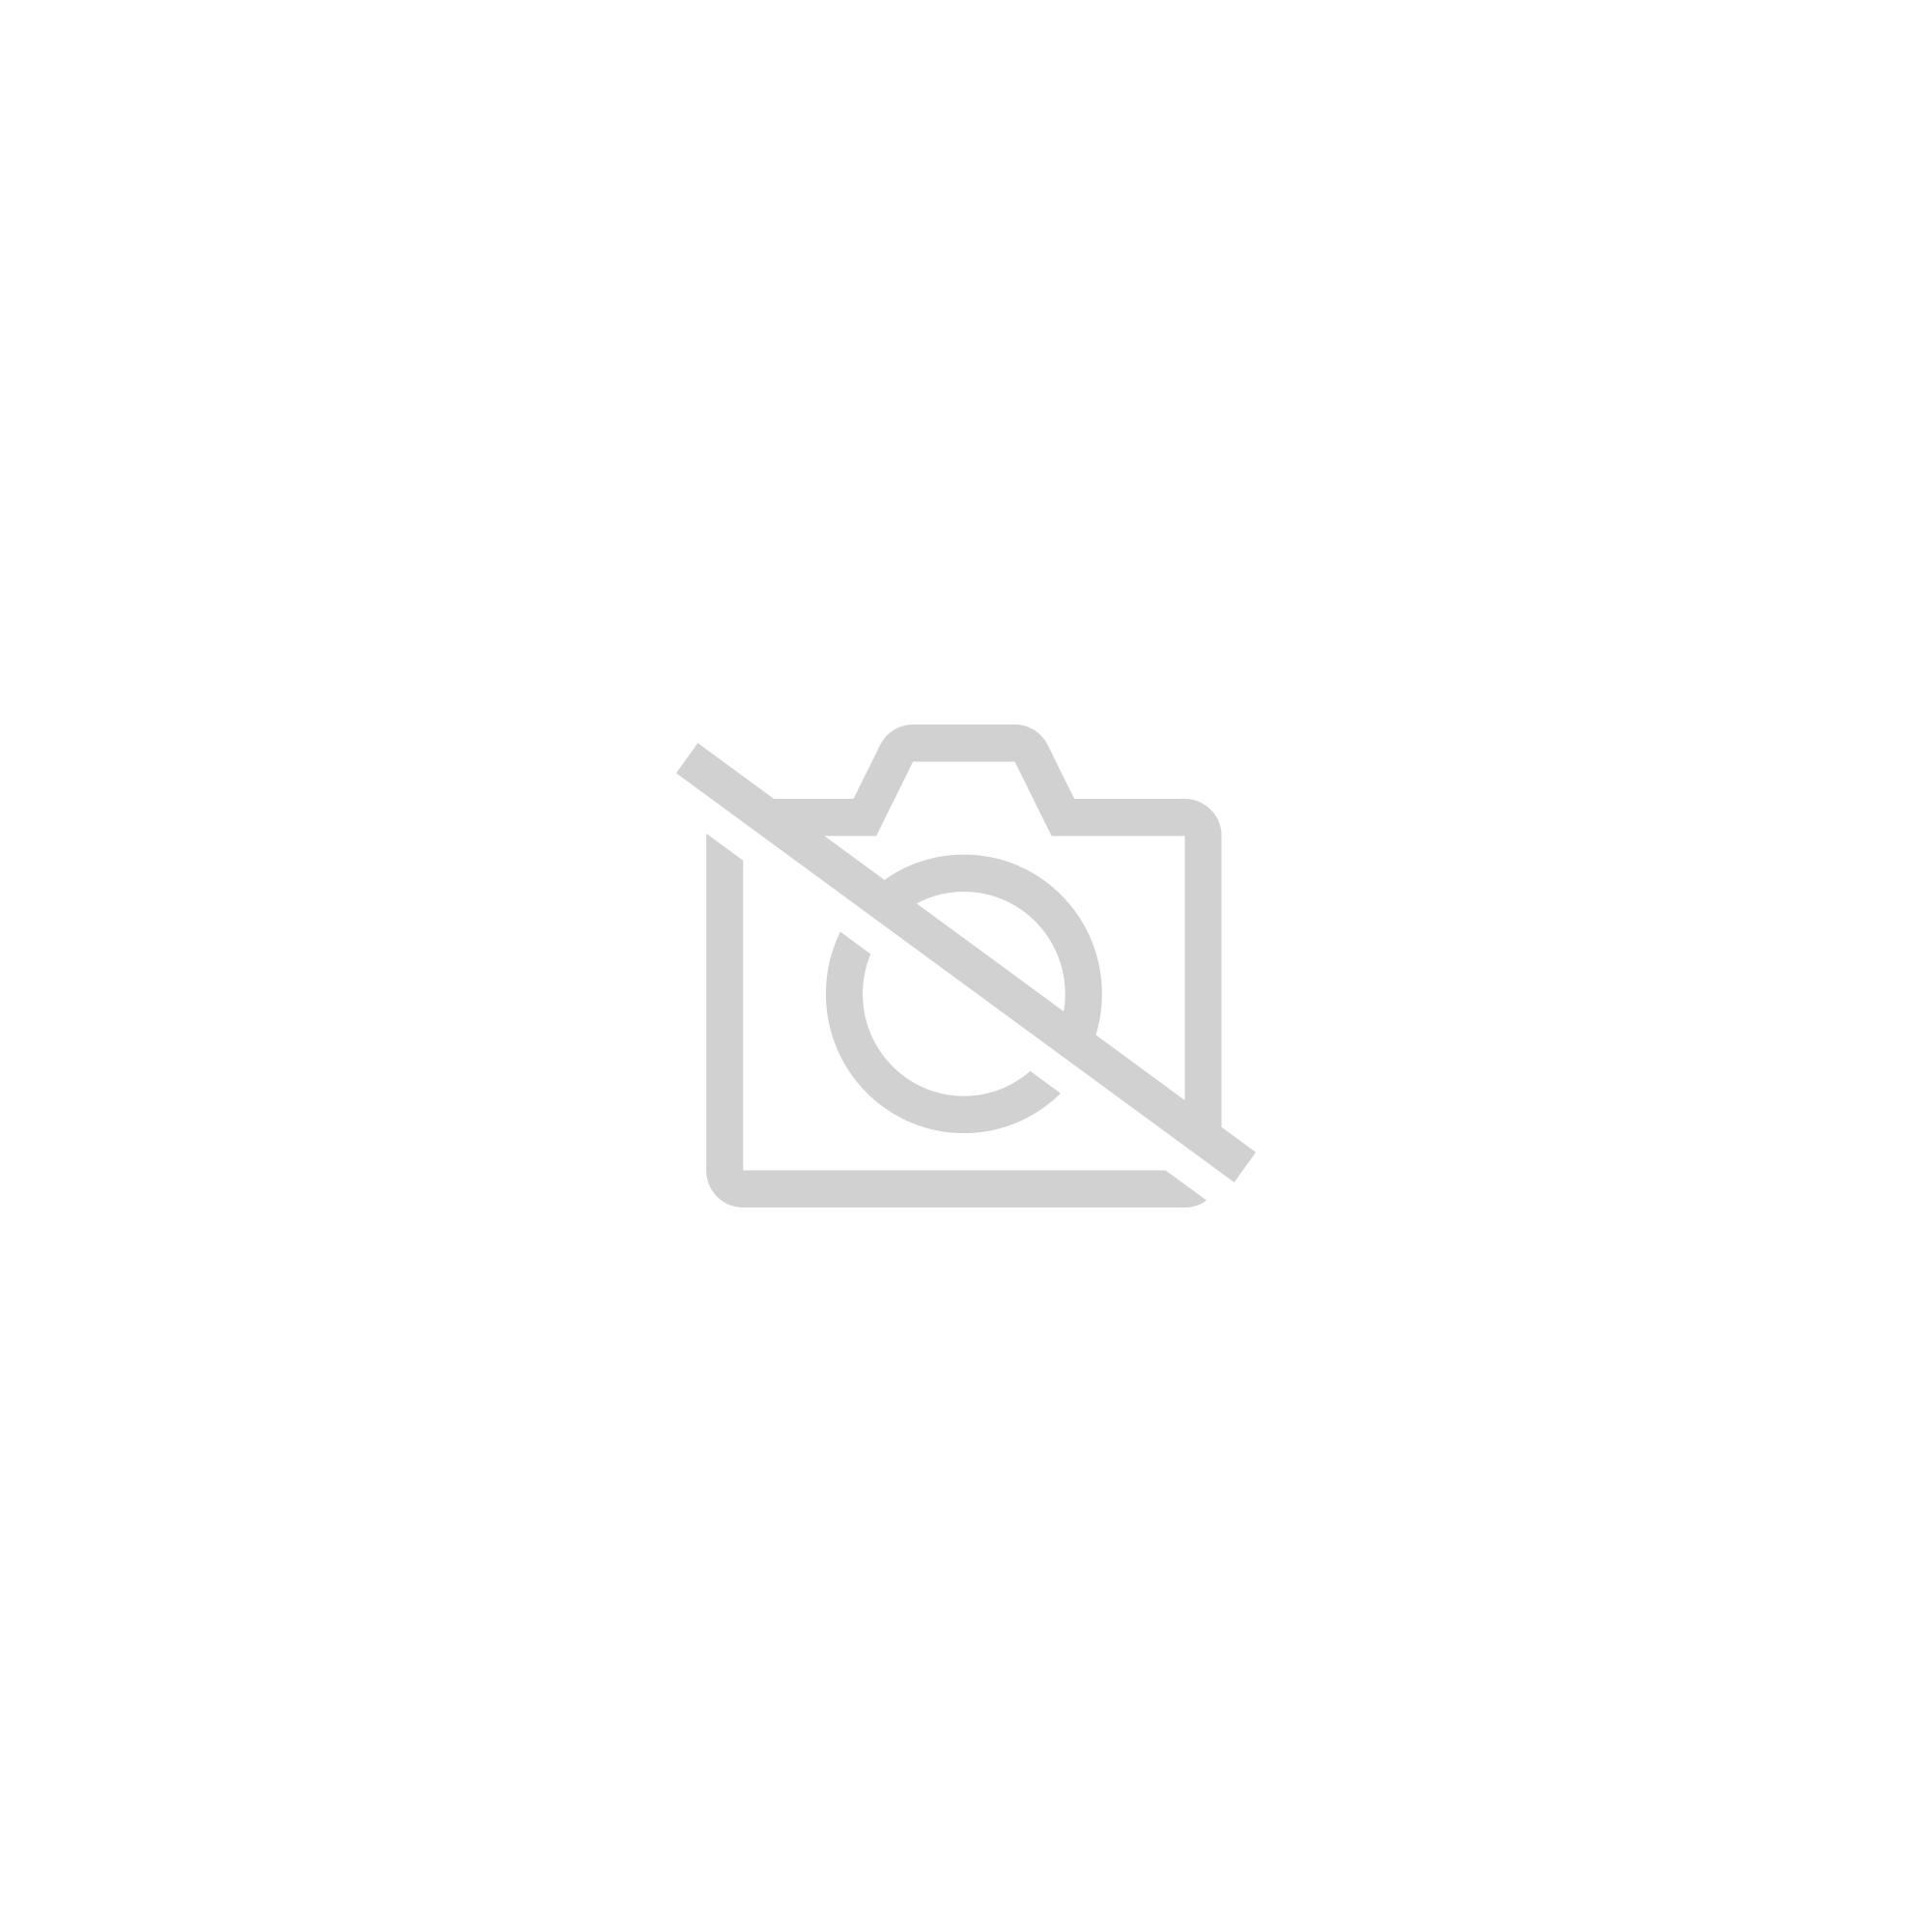 Poster Eminem (The Eminem Show)